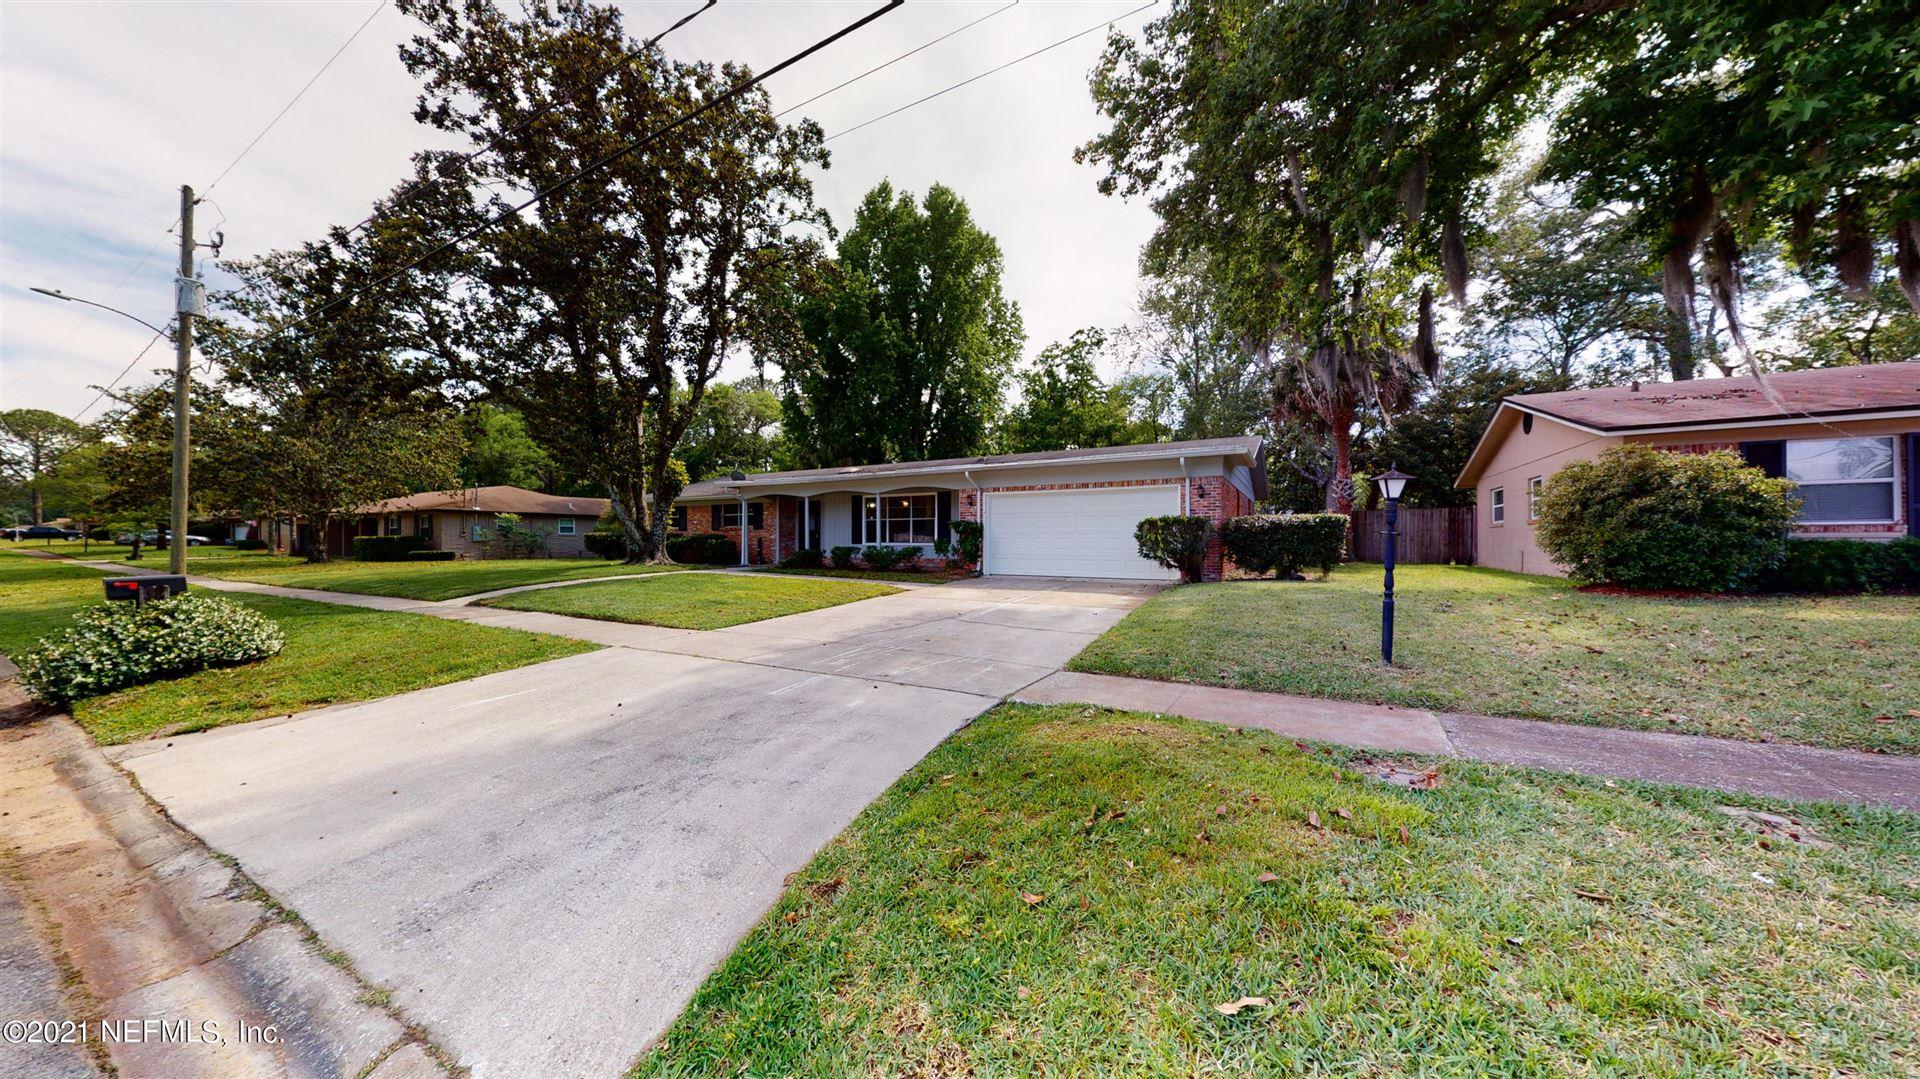 9468 PICKWICK DR, Jacksonville, FL 32257 - MLS#: 1107410